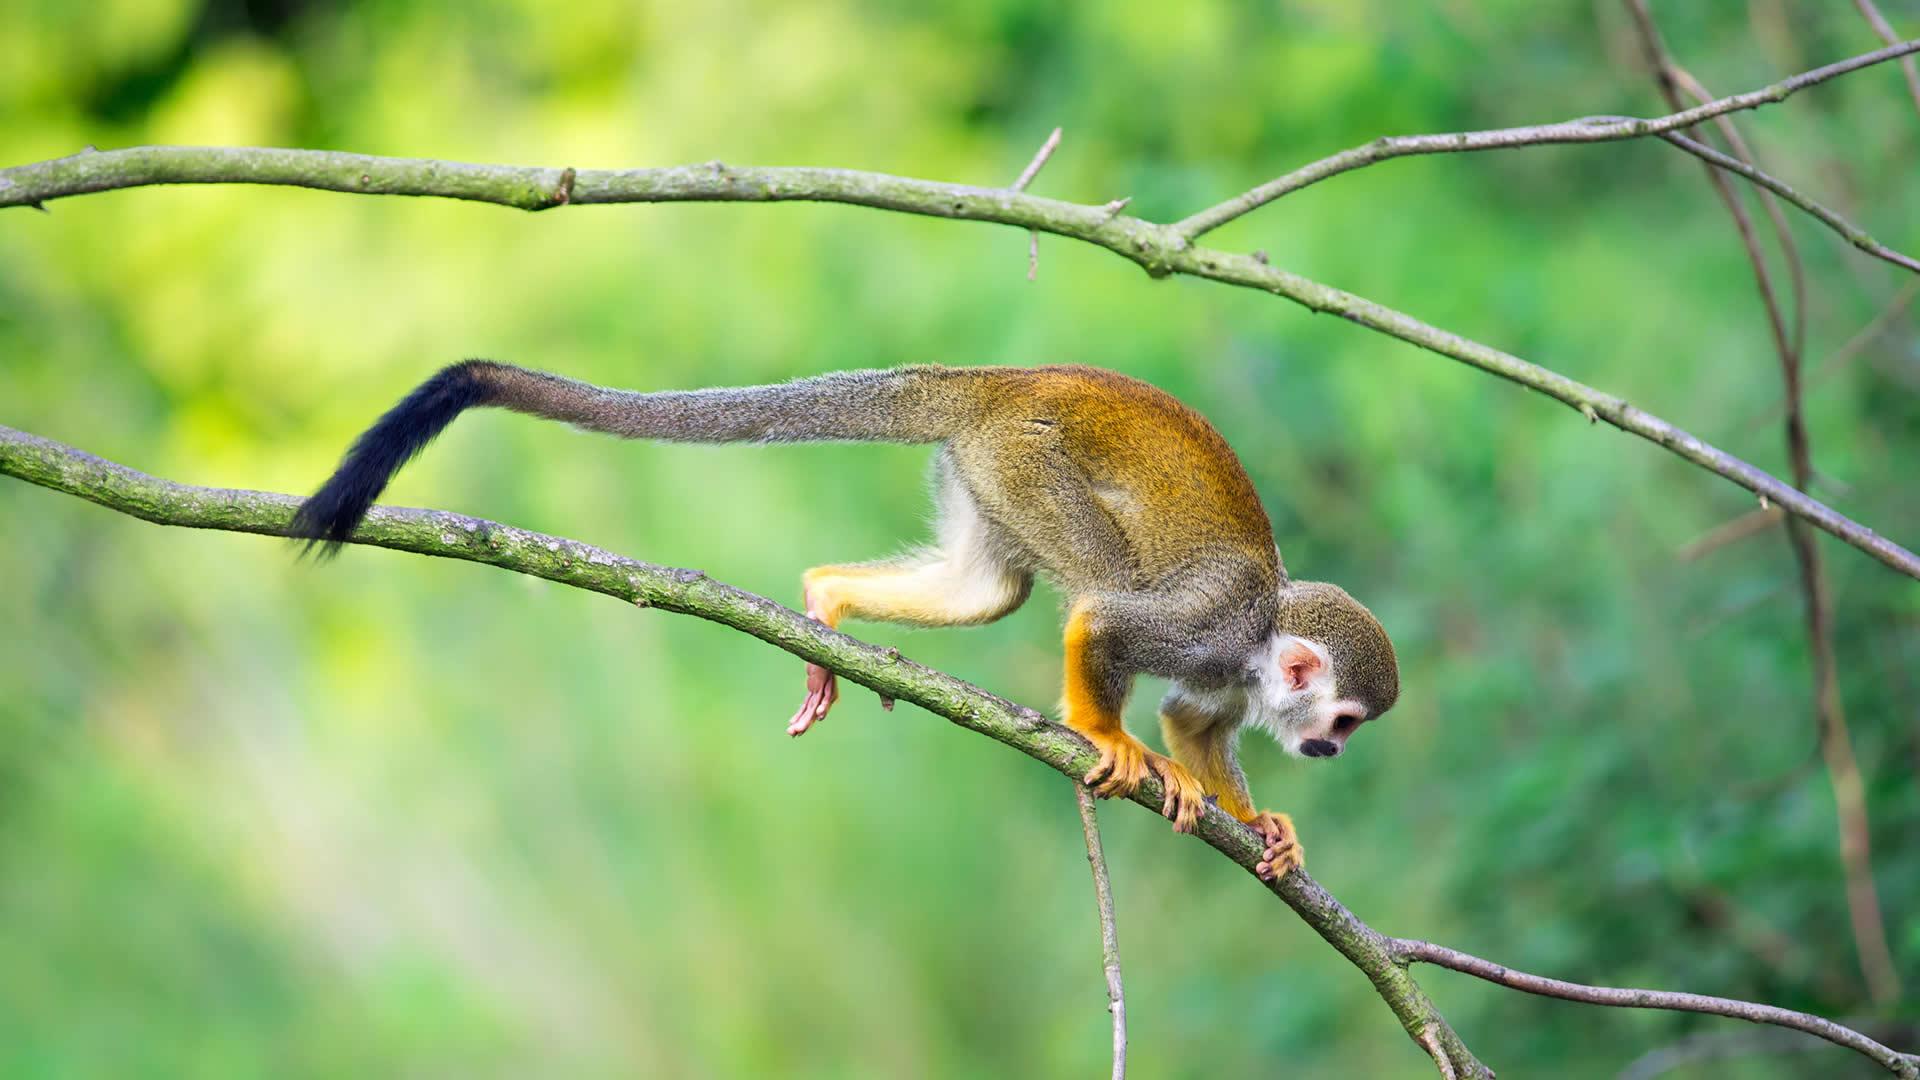 Volunteer With Monkeys In Ecuador At An Inspiring Rescue Centre